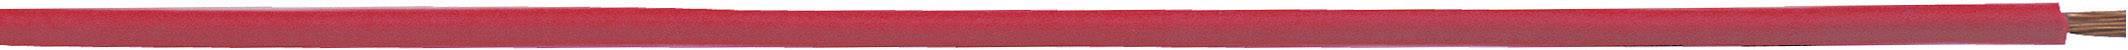 Opletenie / lanko LappKabel 4510022 H05V-K, 1 x 0.75 mm², vonkajší Ø 2.40 mm, 100 m, modrá